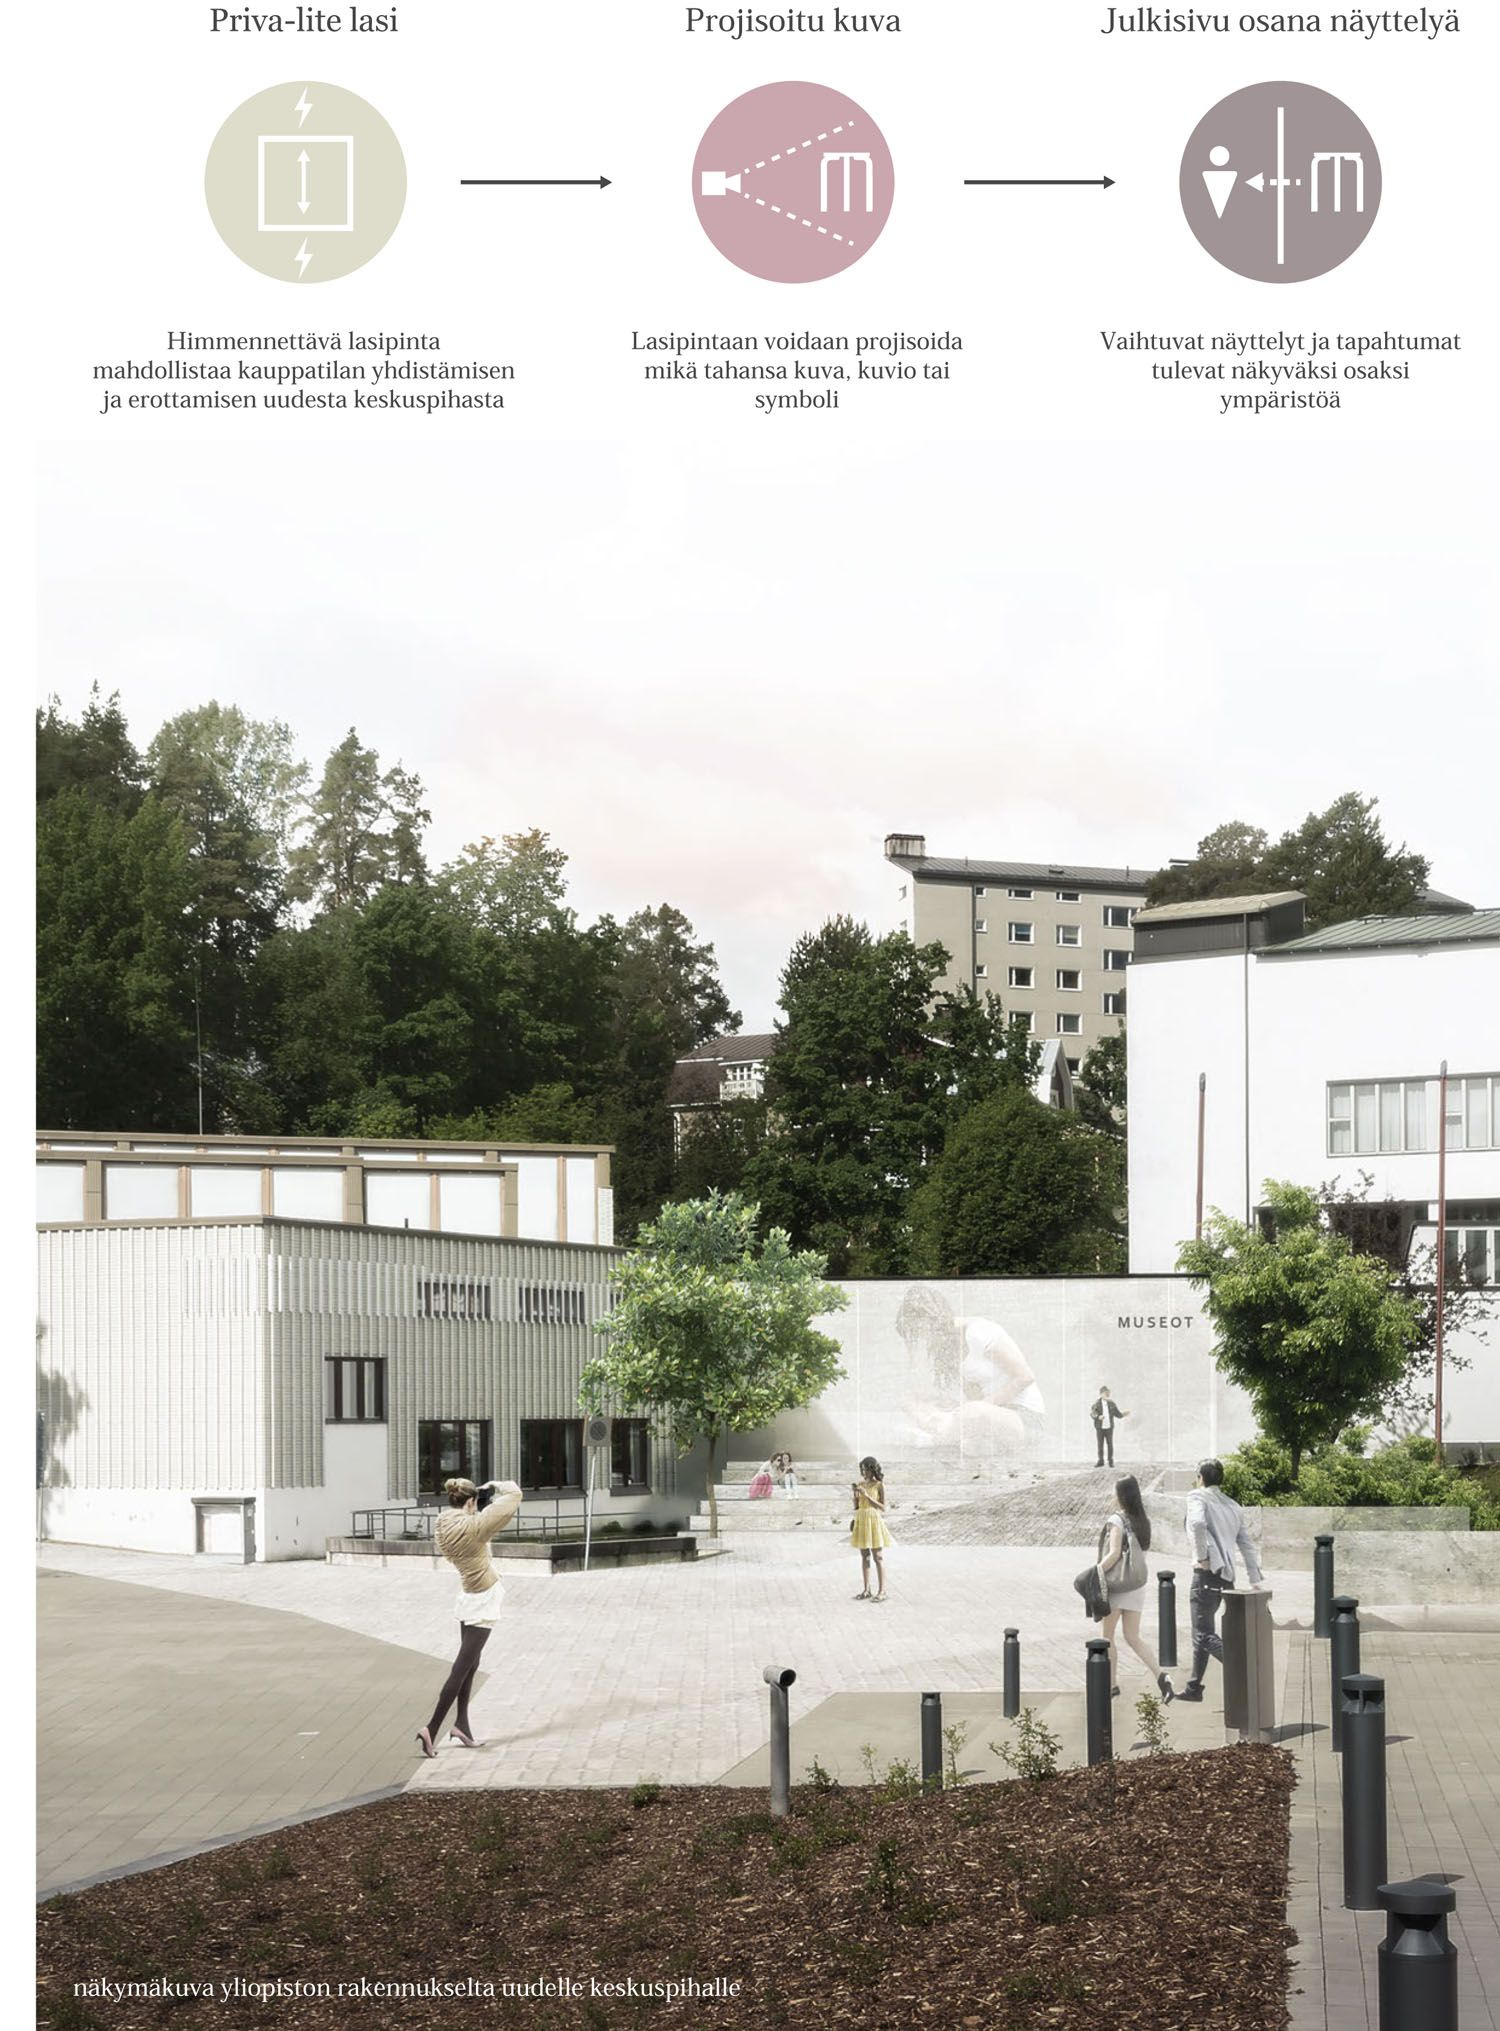 Alvar Aalto MUSEO Check site www.alvaraalto.fi/ruusupuisto for author information